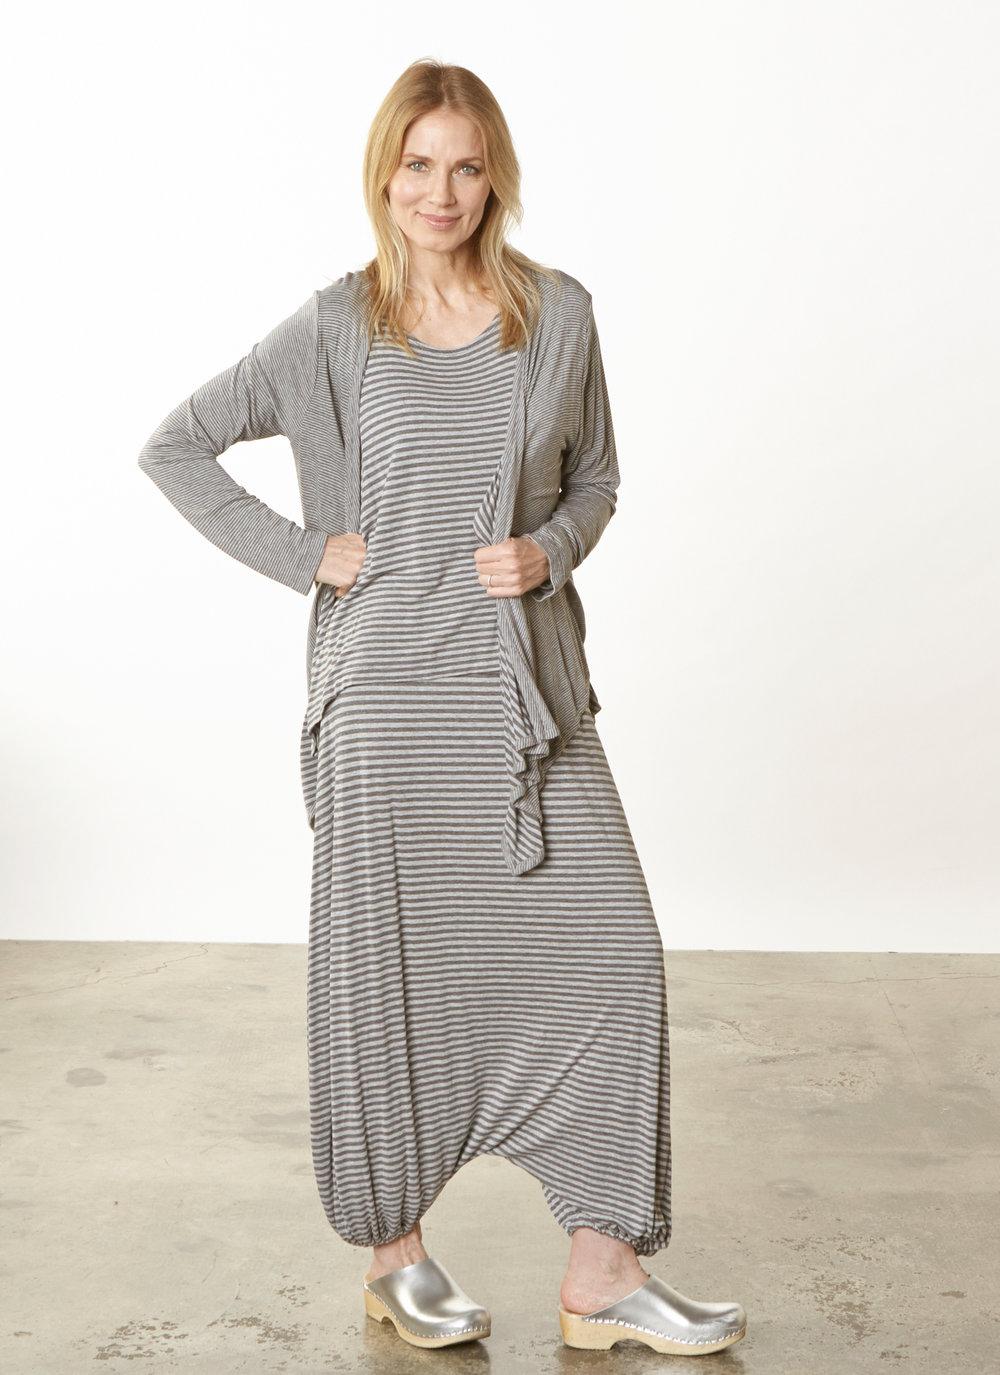 Alta Cardigan,Renee Tank, Gaucho Pant in Grey Double Stripe Jersey